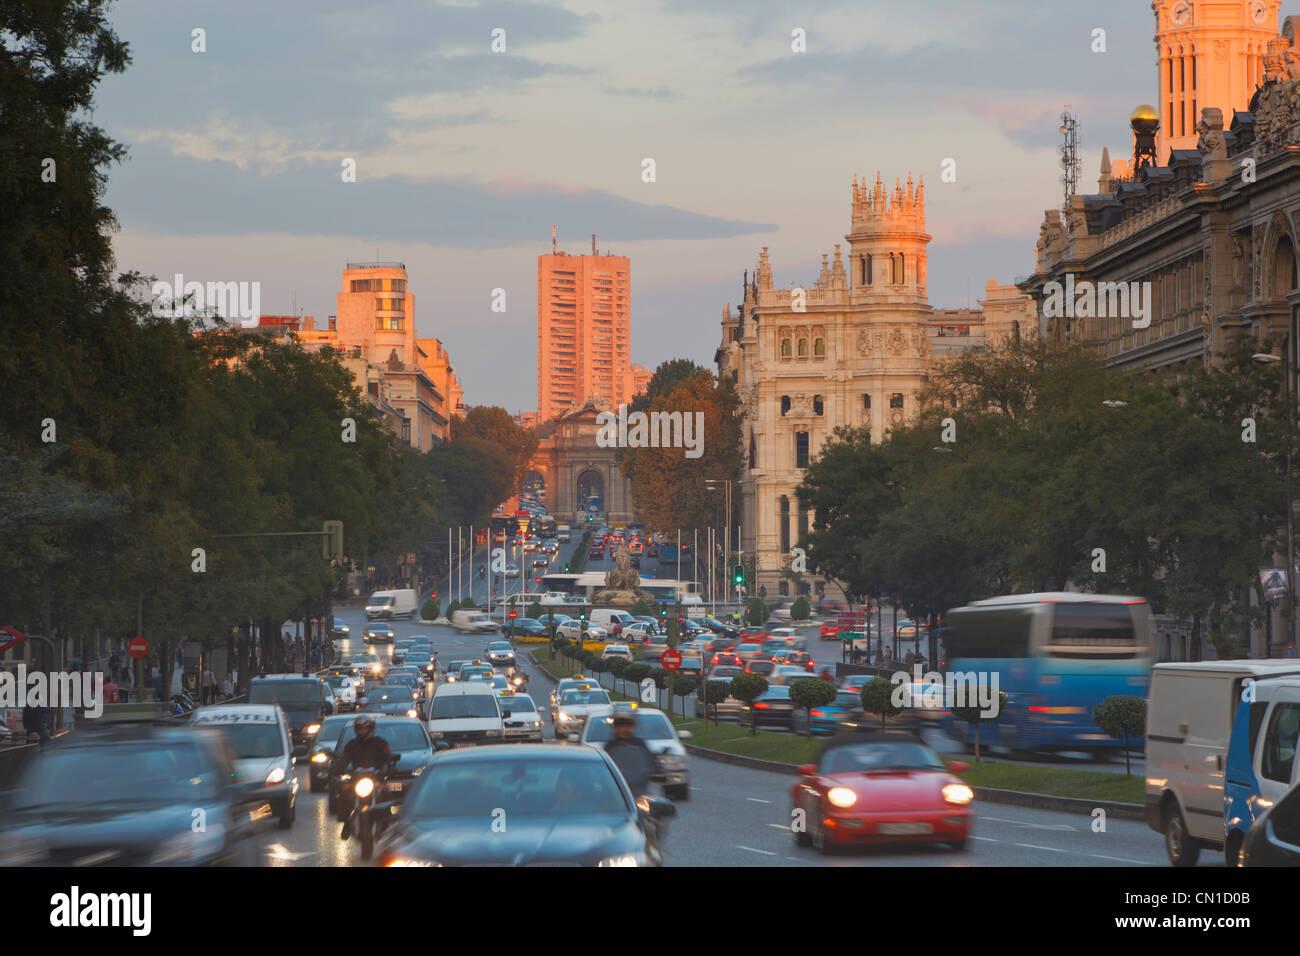 Madrid, Spain. Calle de Alcala at dusk. - Stock Image